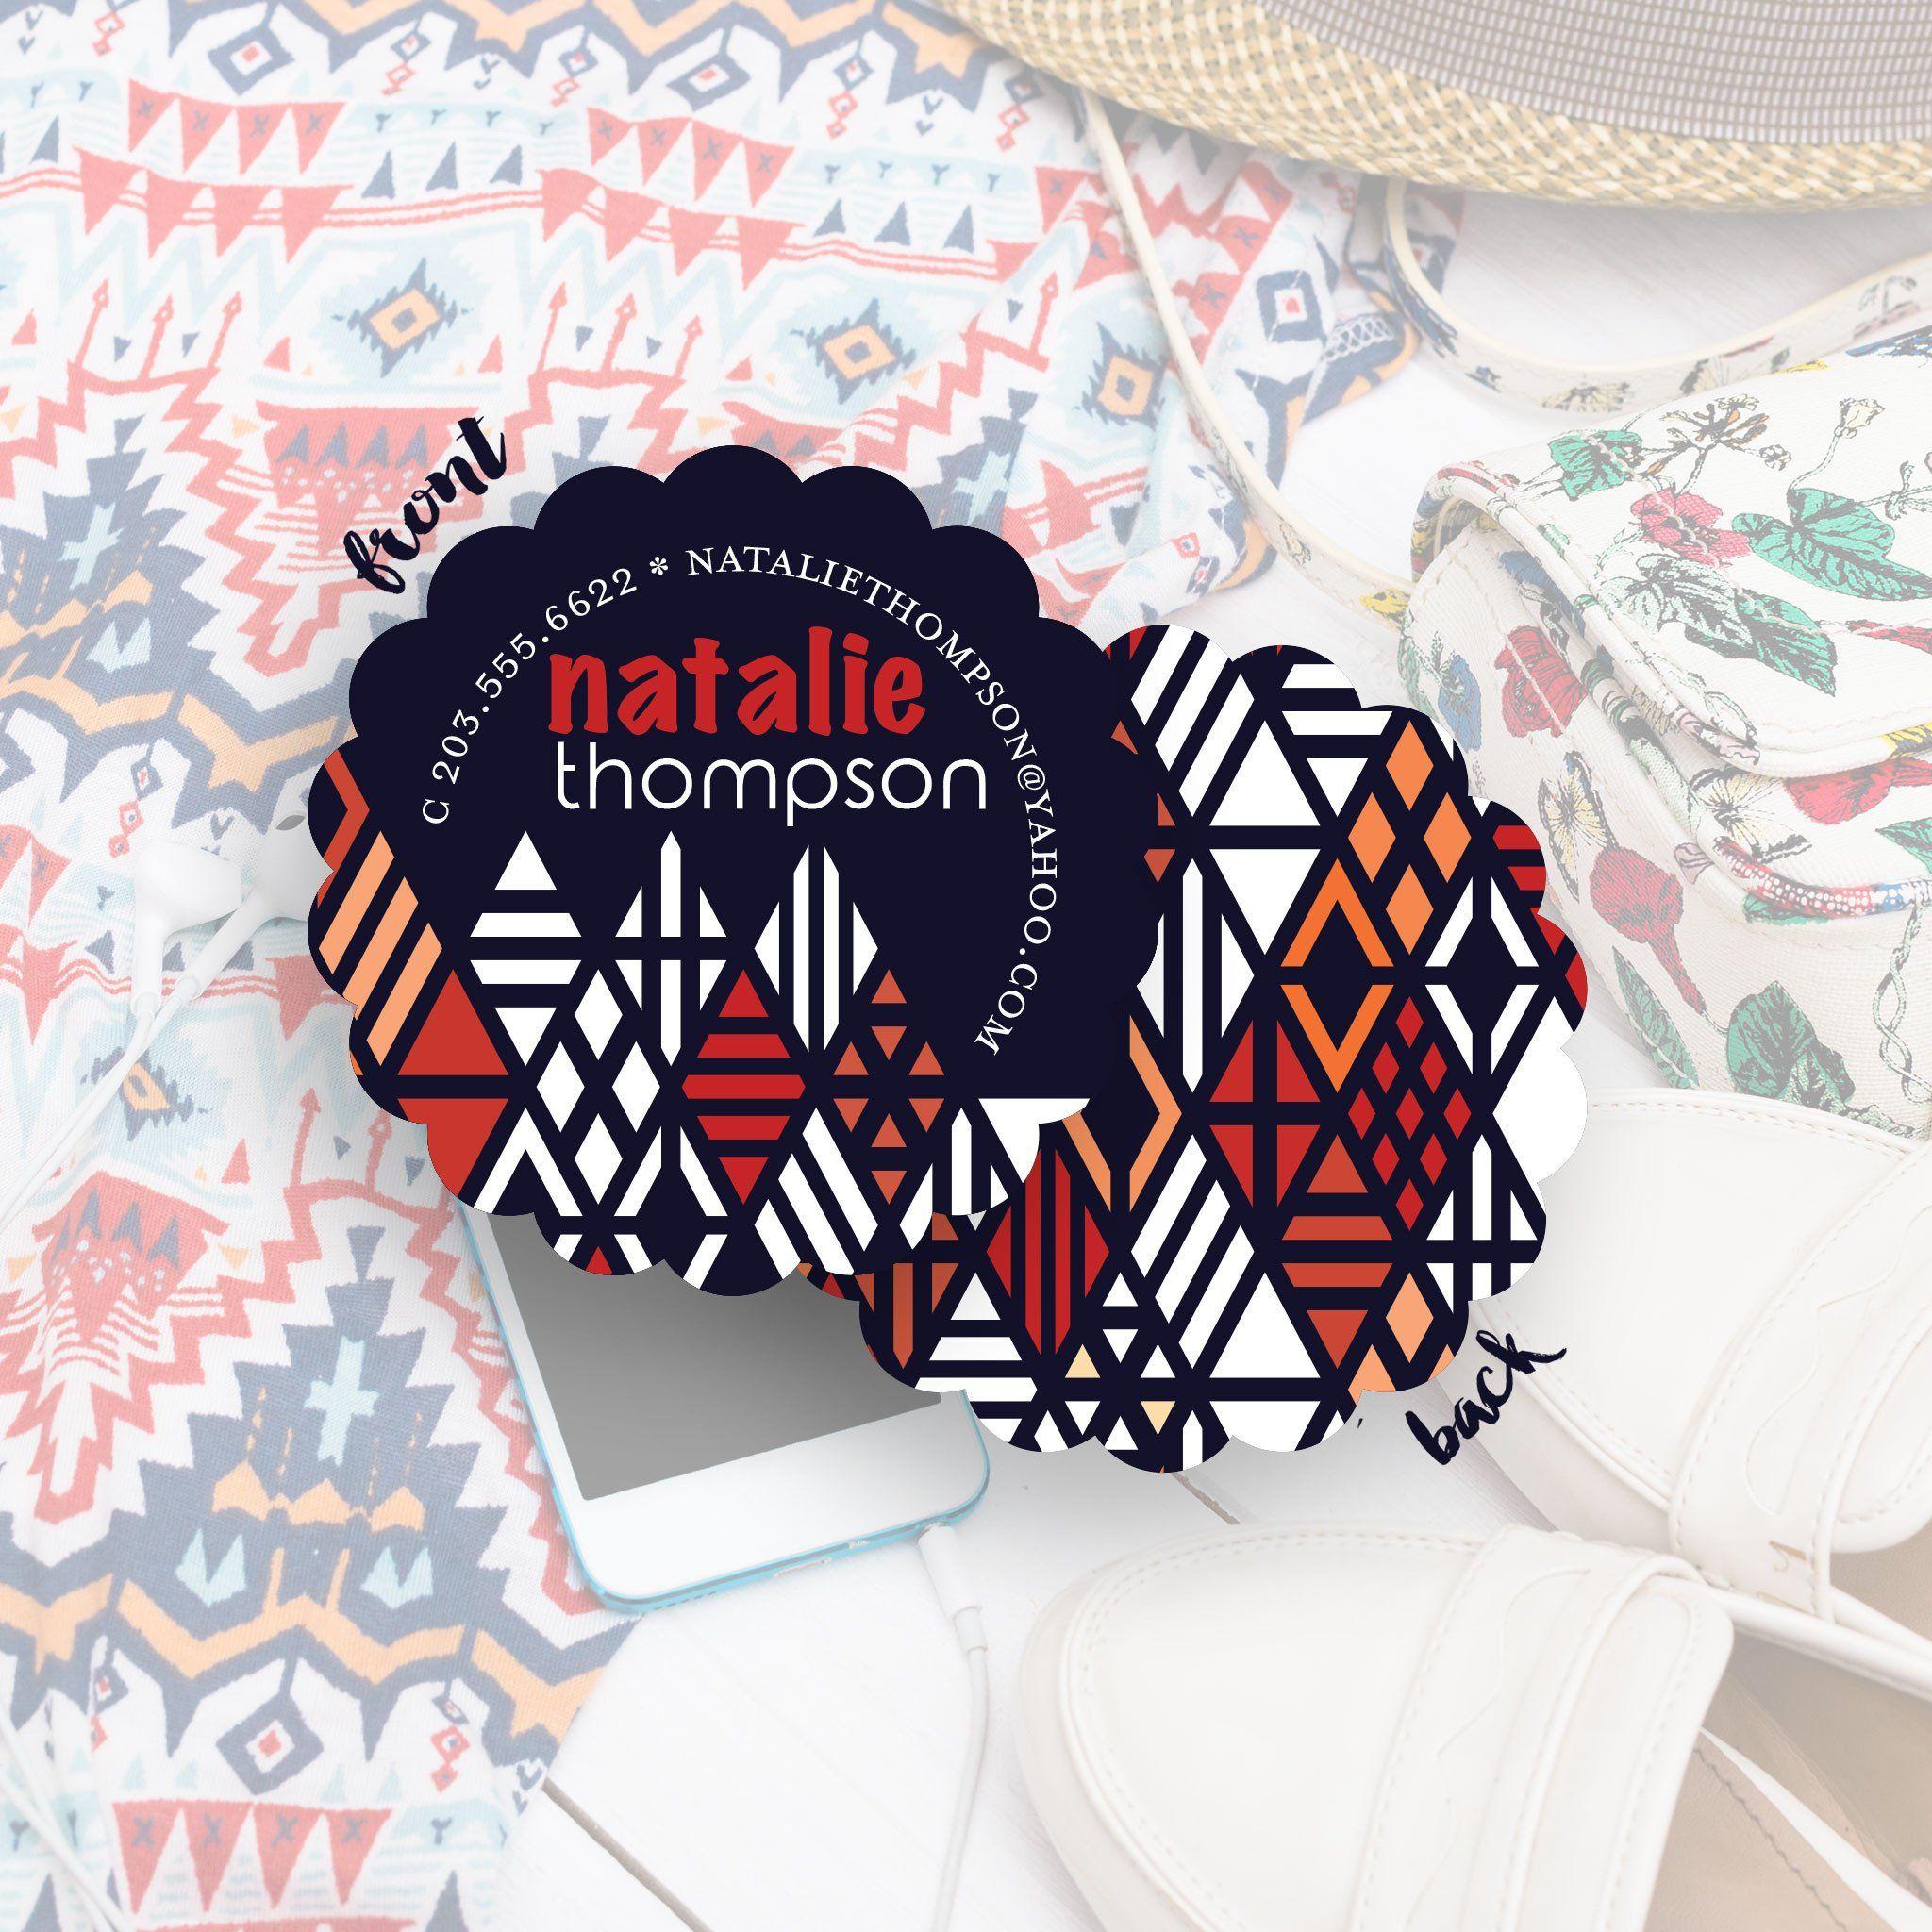 Natalie 21st geometric business card ideas business card ideas circular business cards colourmoves Choice Image